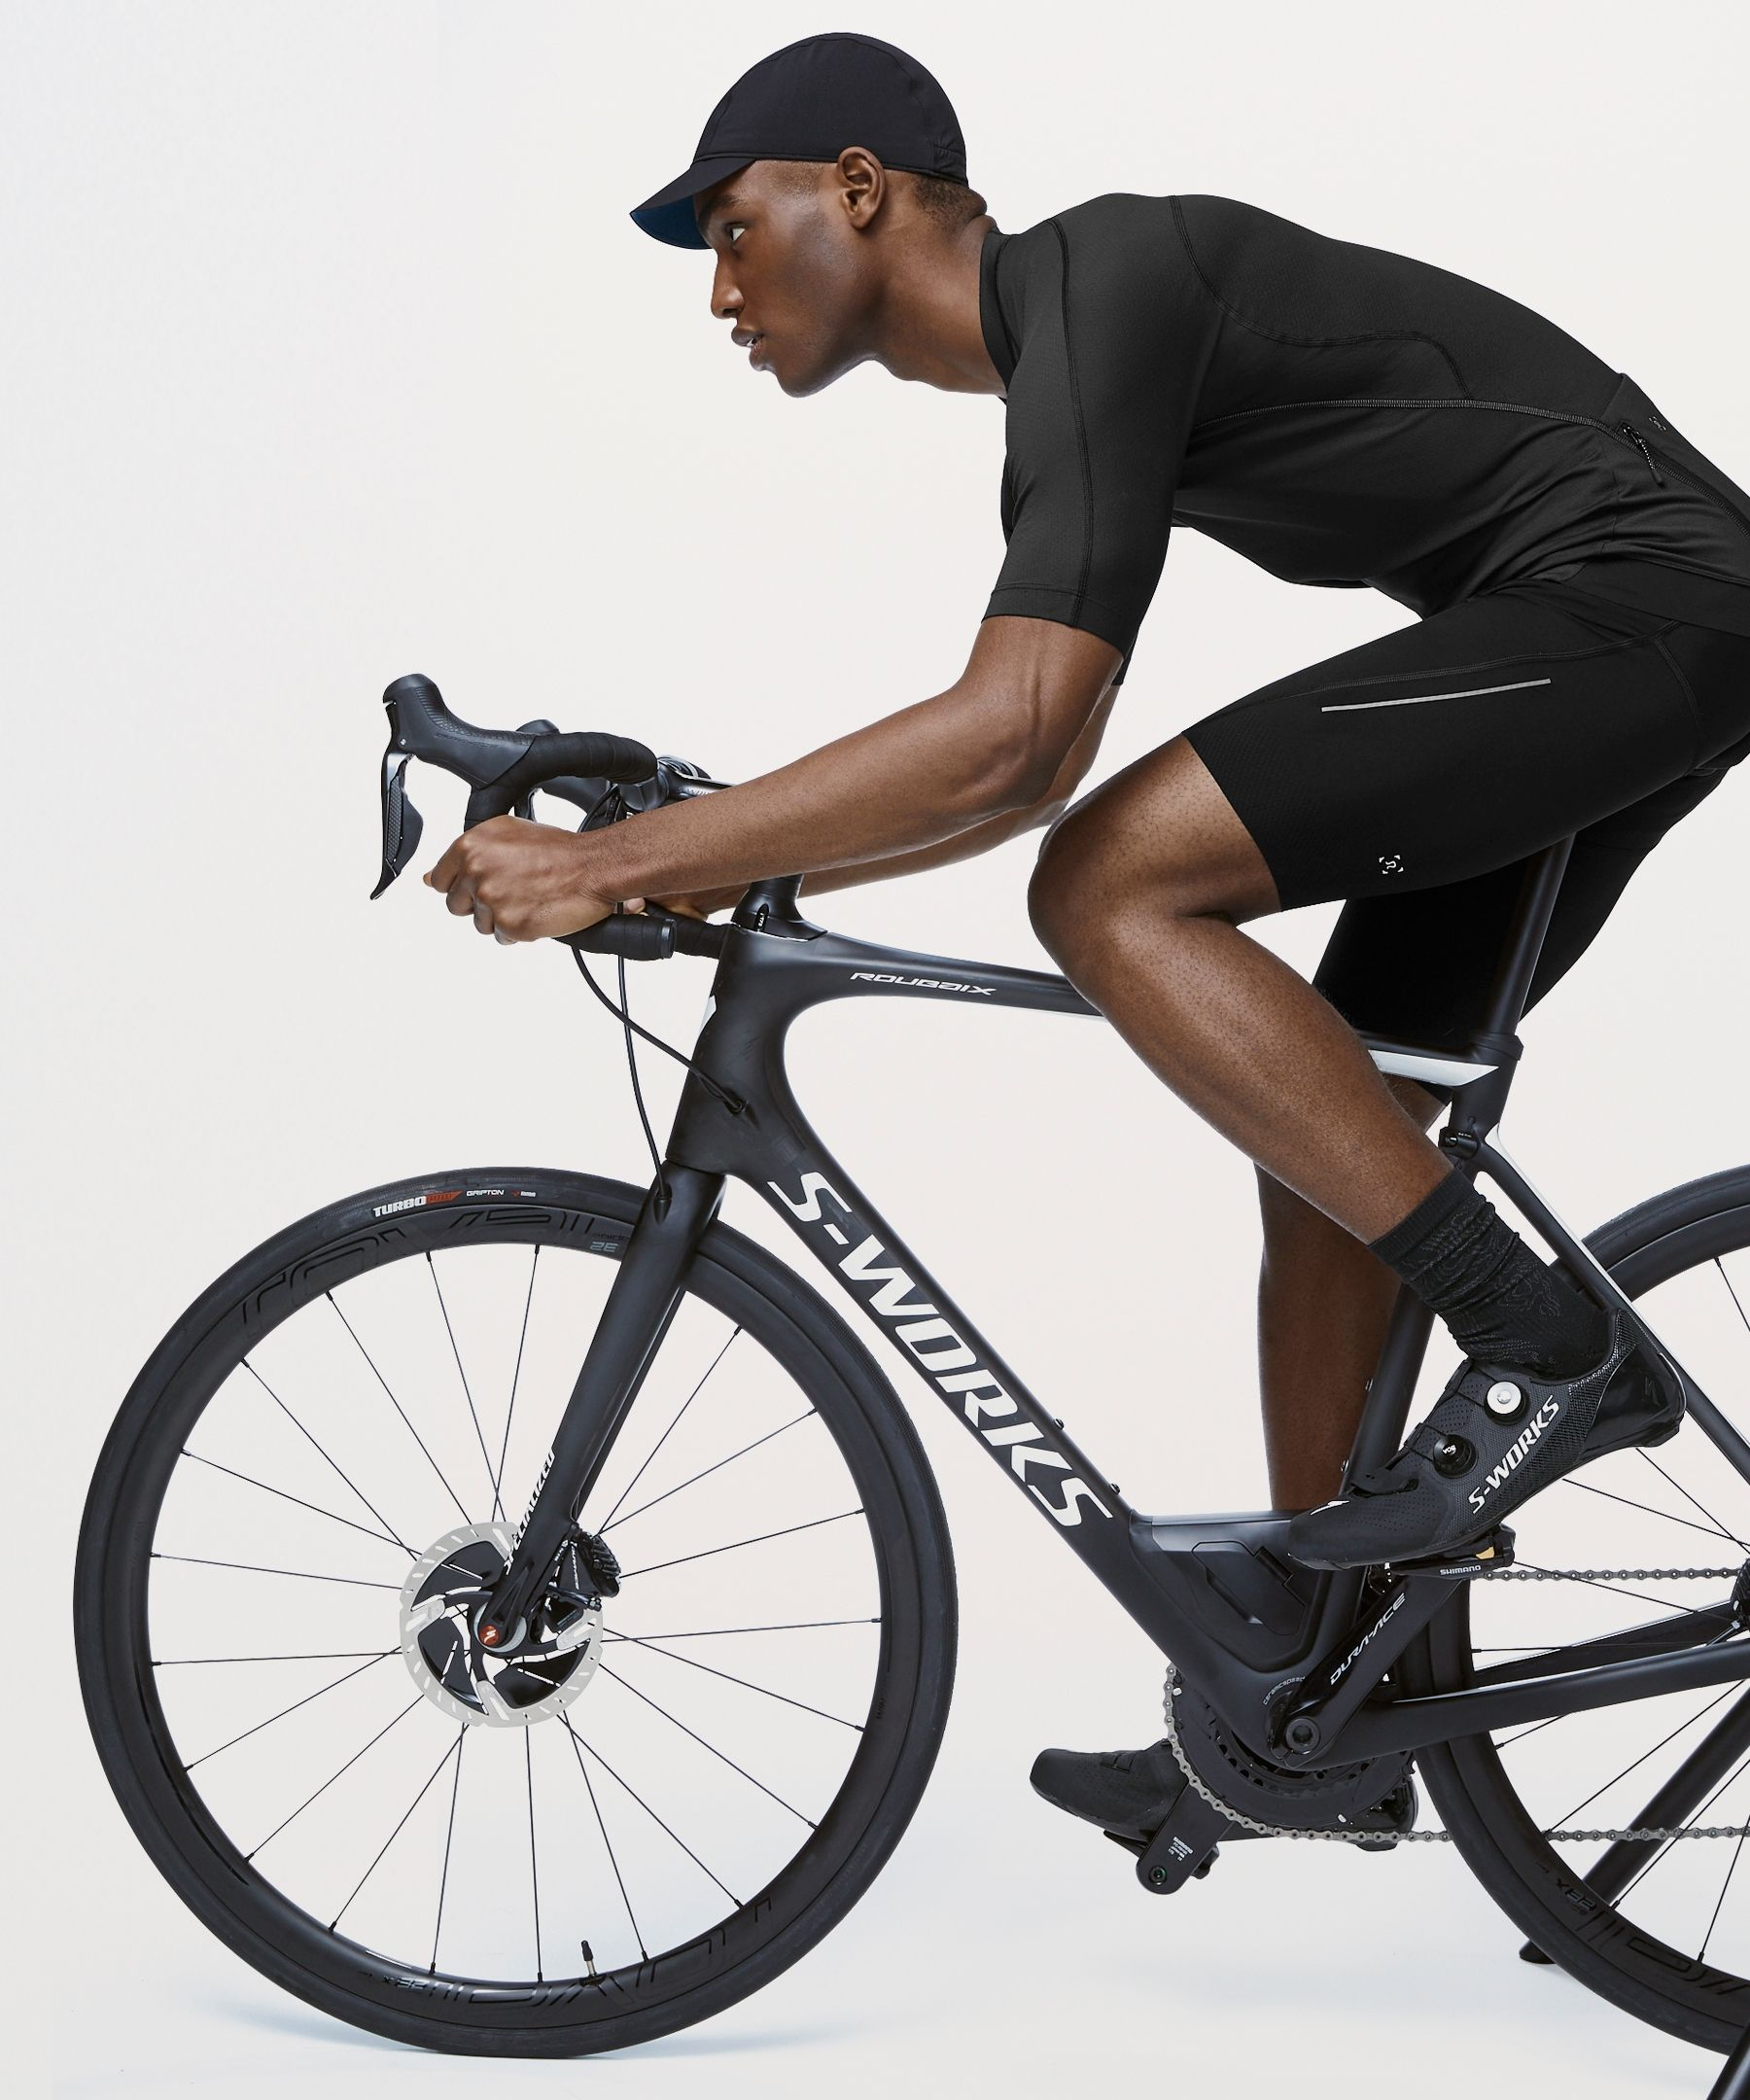 Lululemon Men S City To Summit Cycling Jersey Black Size Xl Lululemon Men Cycling Lululemon